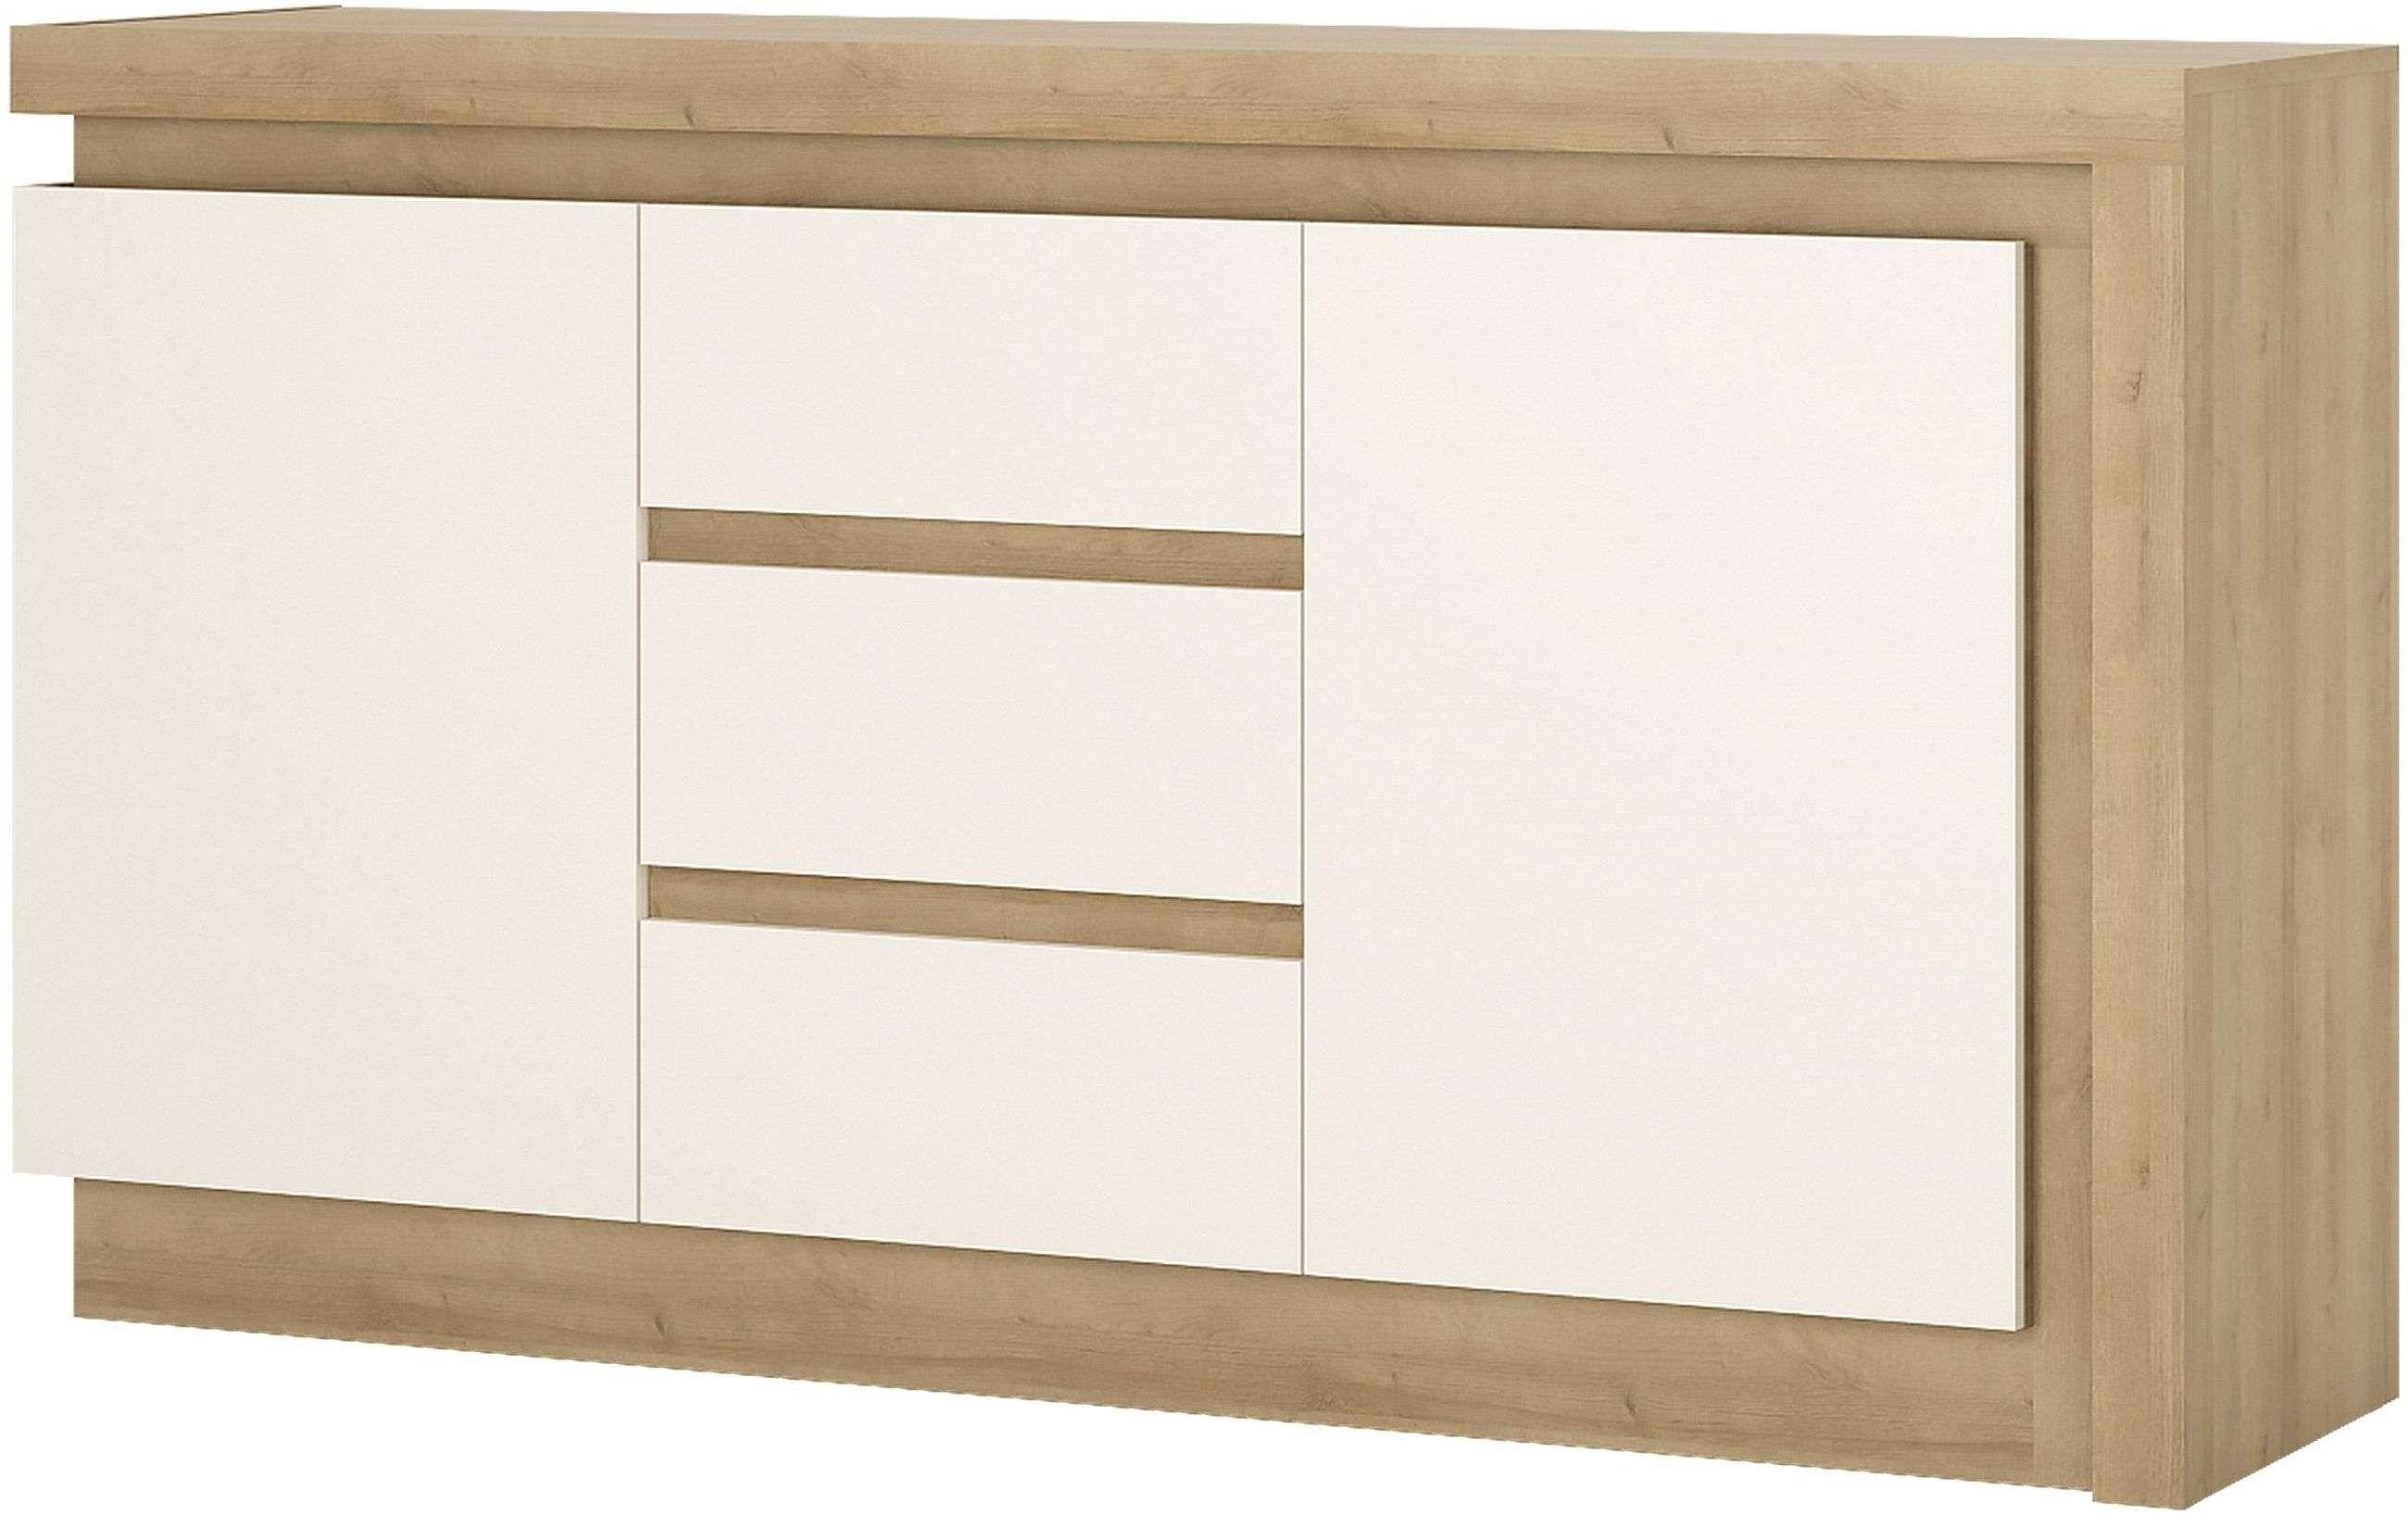 Buy Lyon Riviera Oak And White High Gloss Sideboard – 2 Door 3 Pertaining To White High Gloss Sideboards (View 12 of 20)